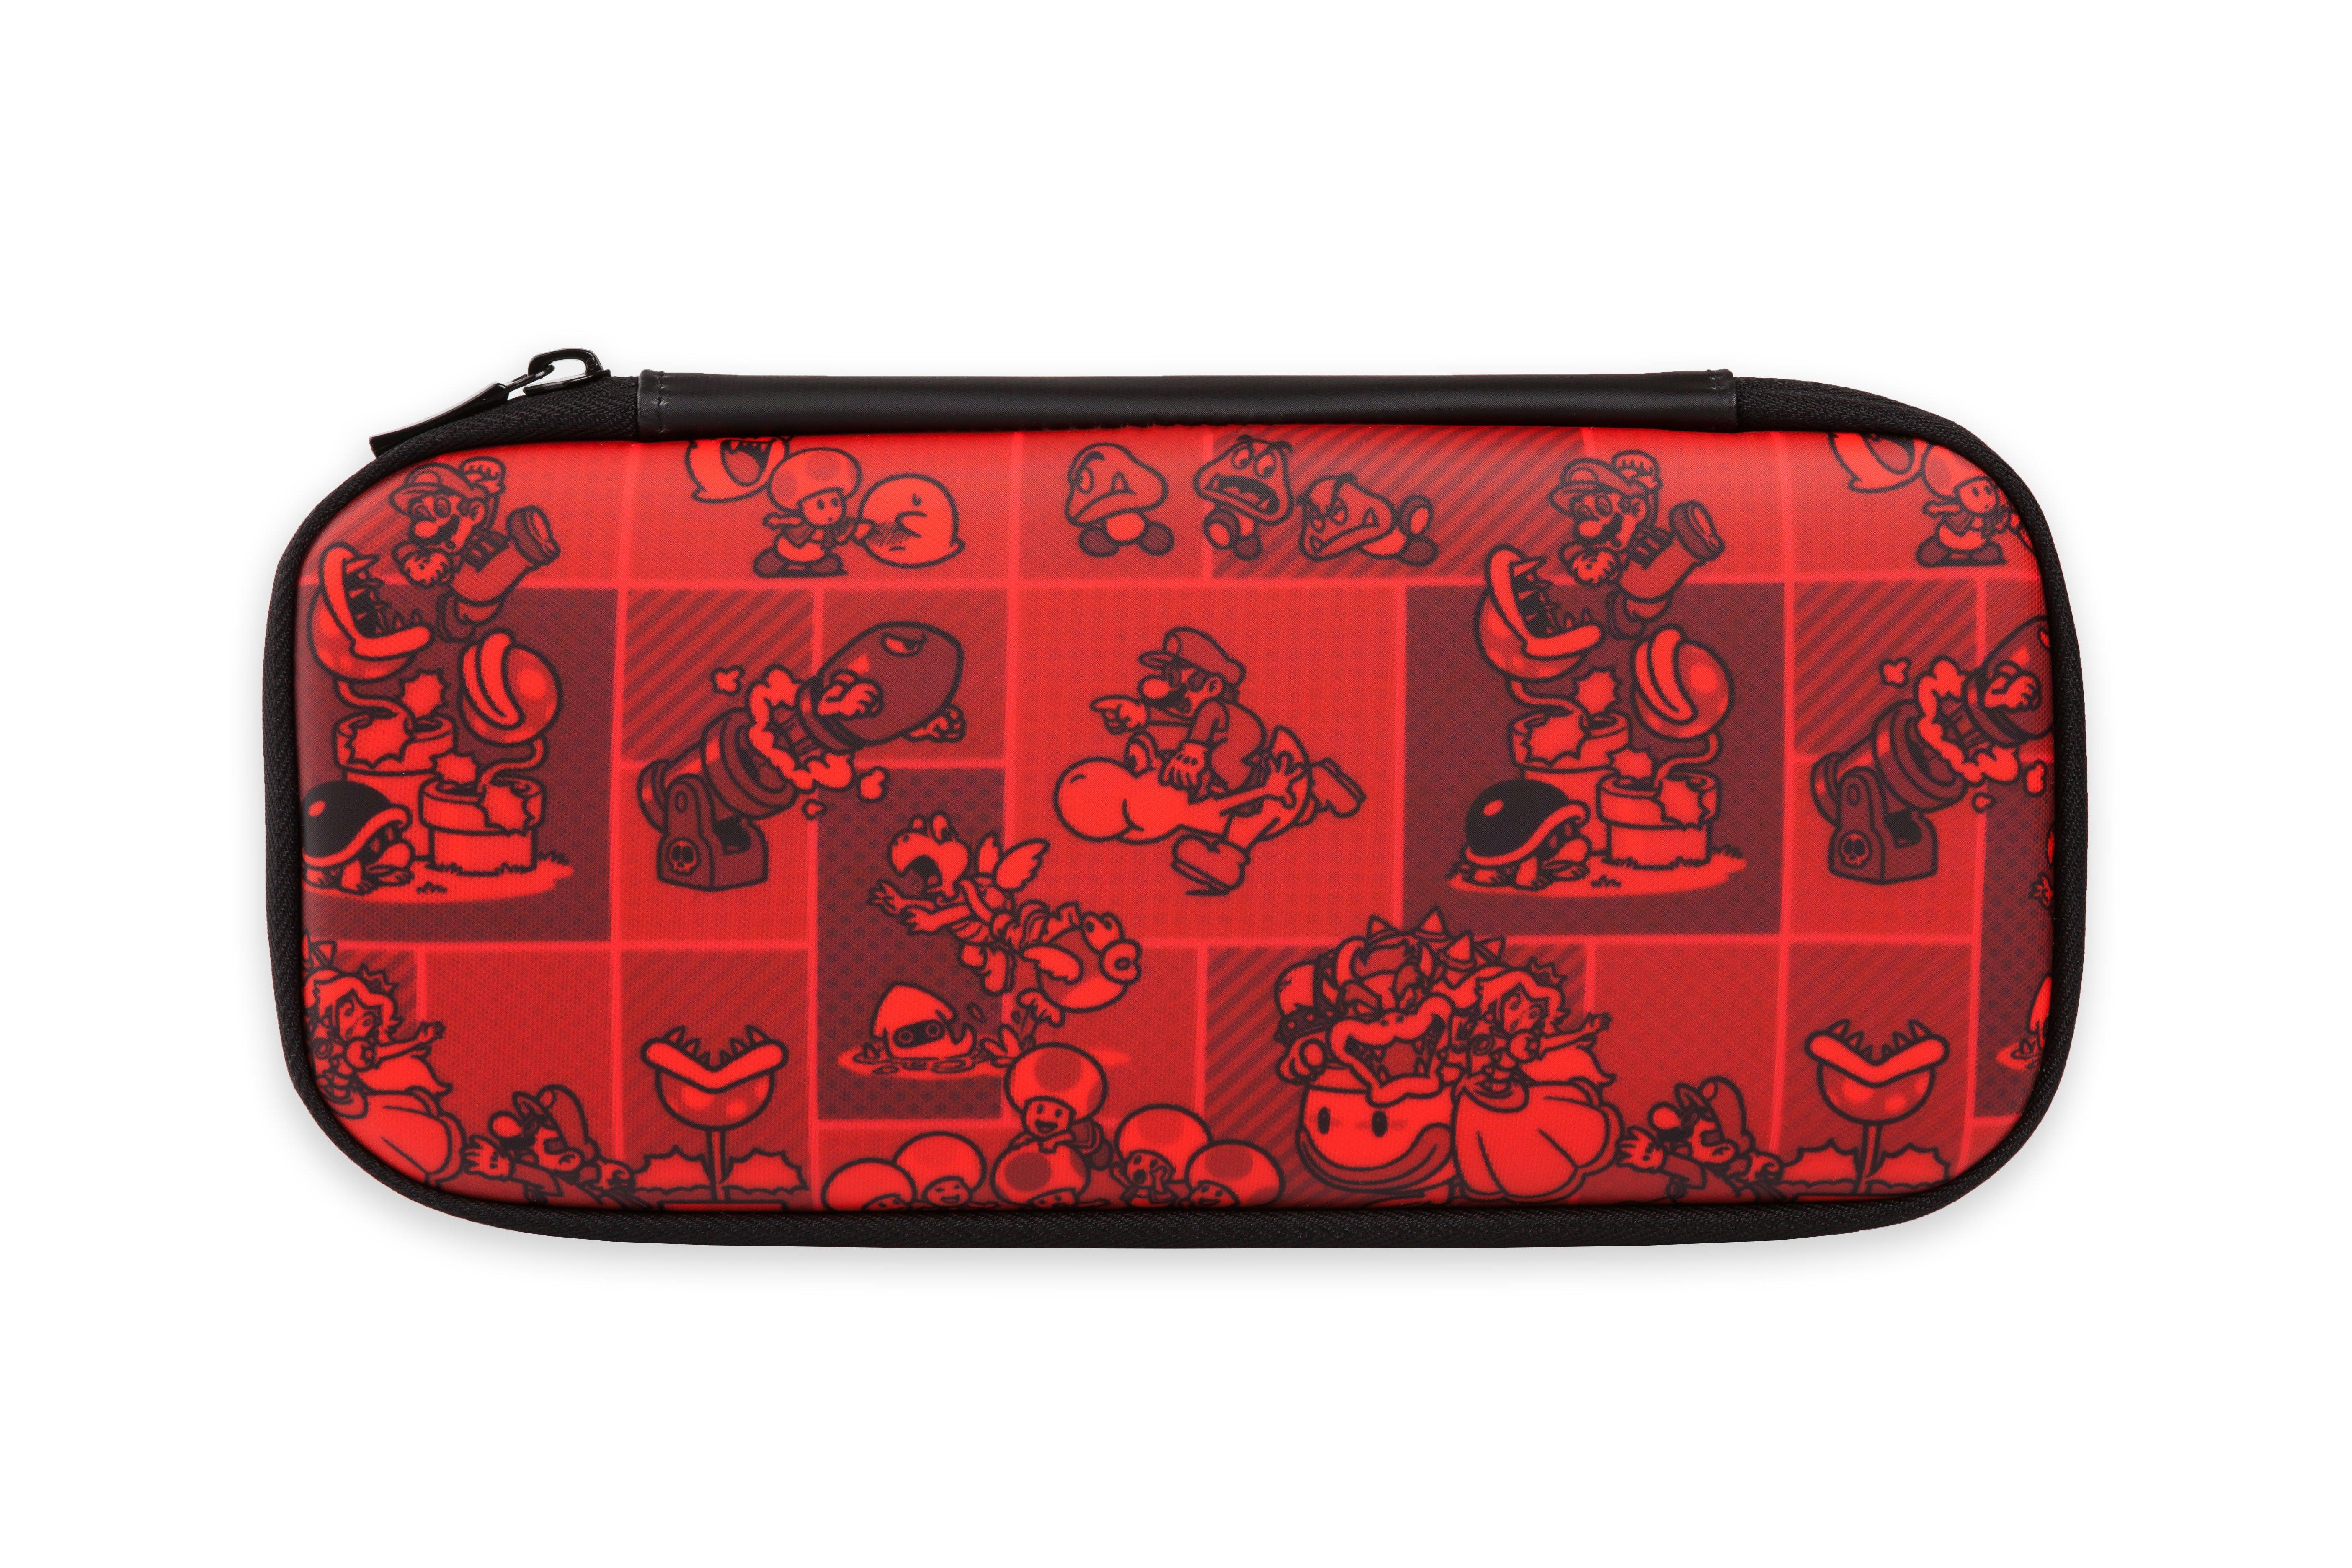 PowerA Stealth Console Case - Mario